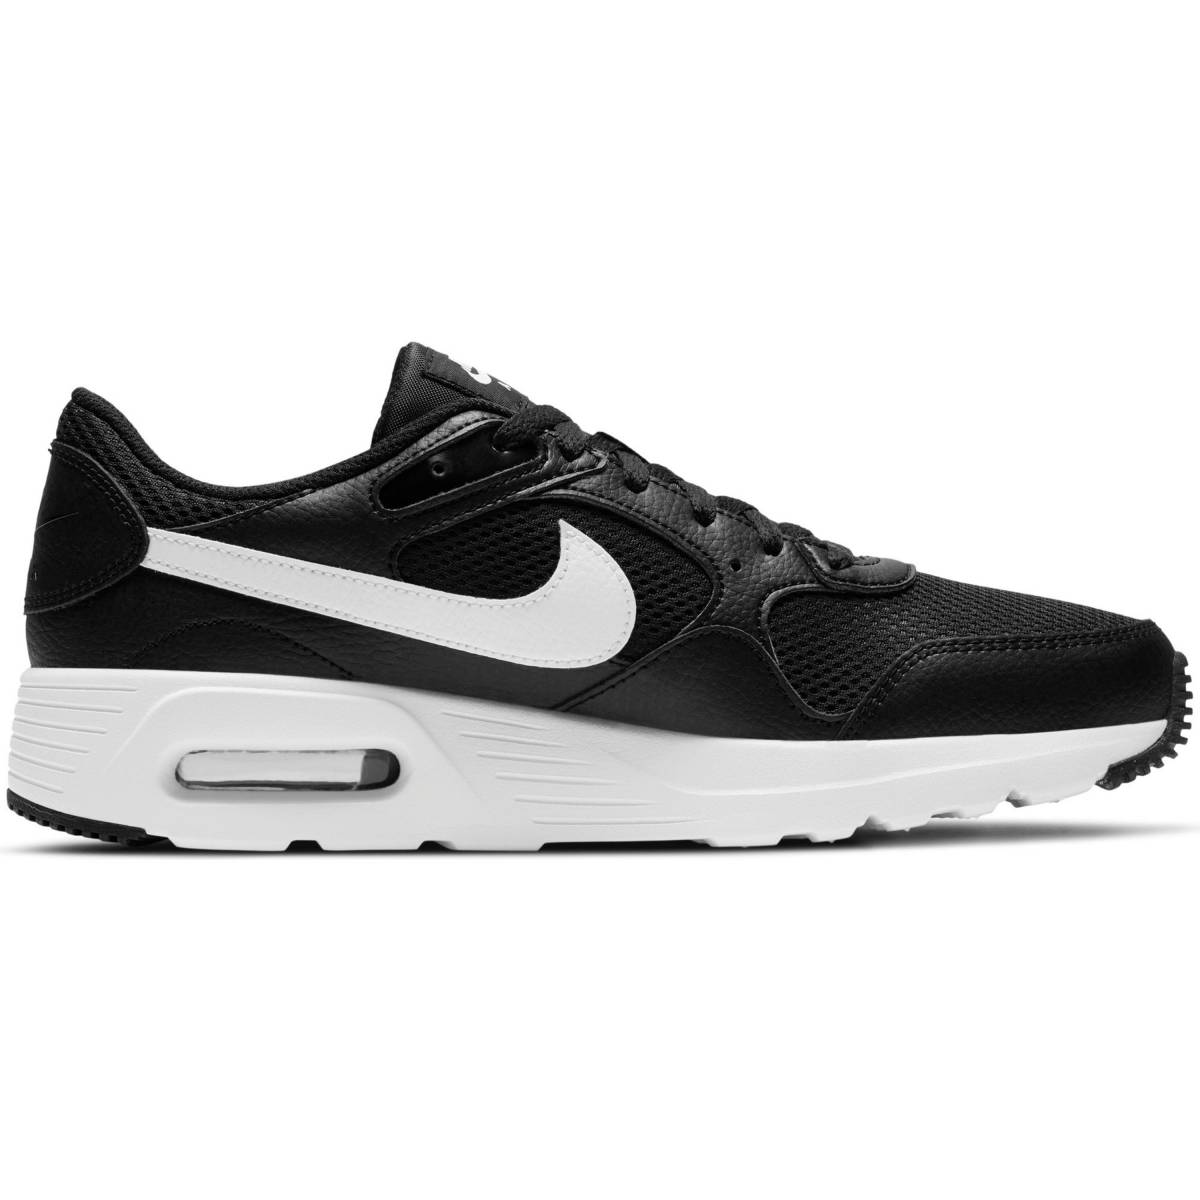 Nike Air Max SC Herren Sneaker schwarz weiß